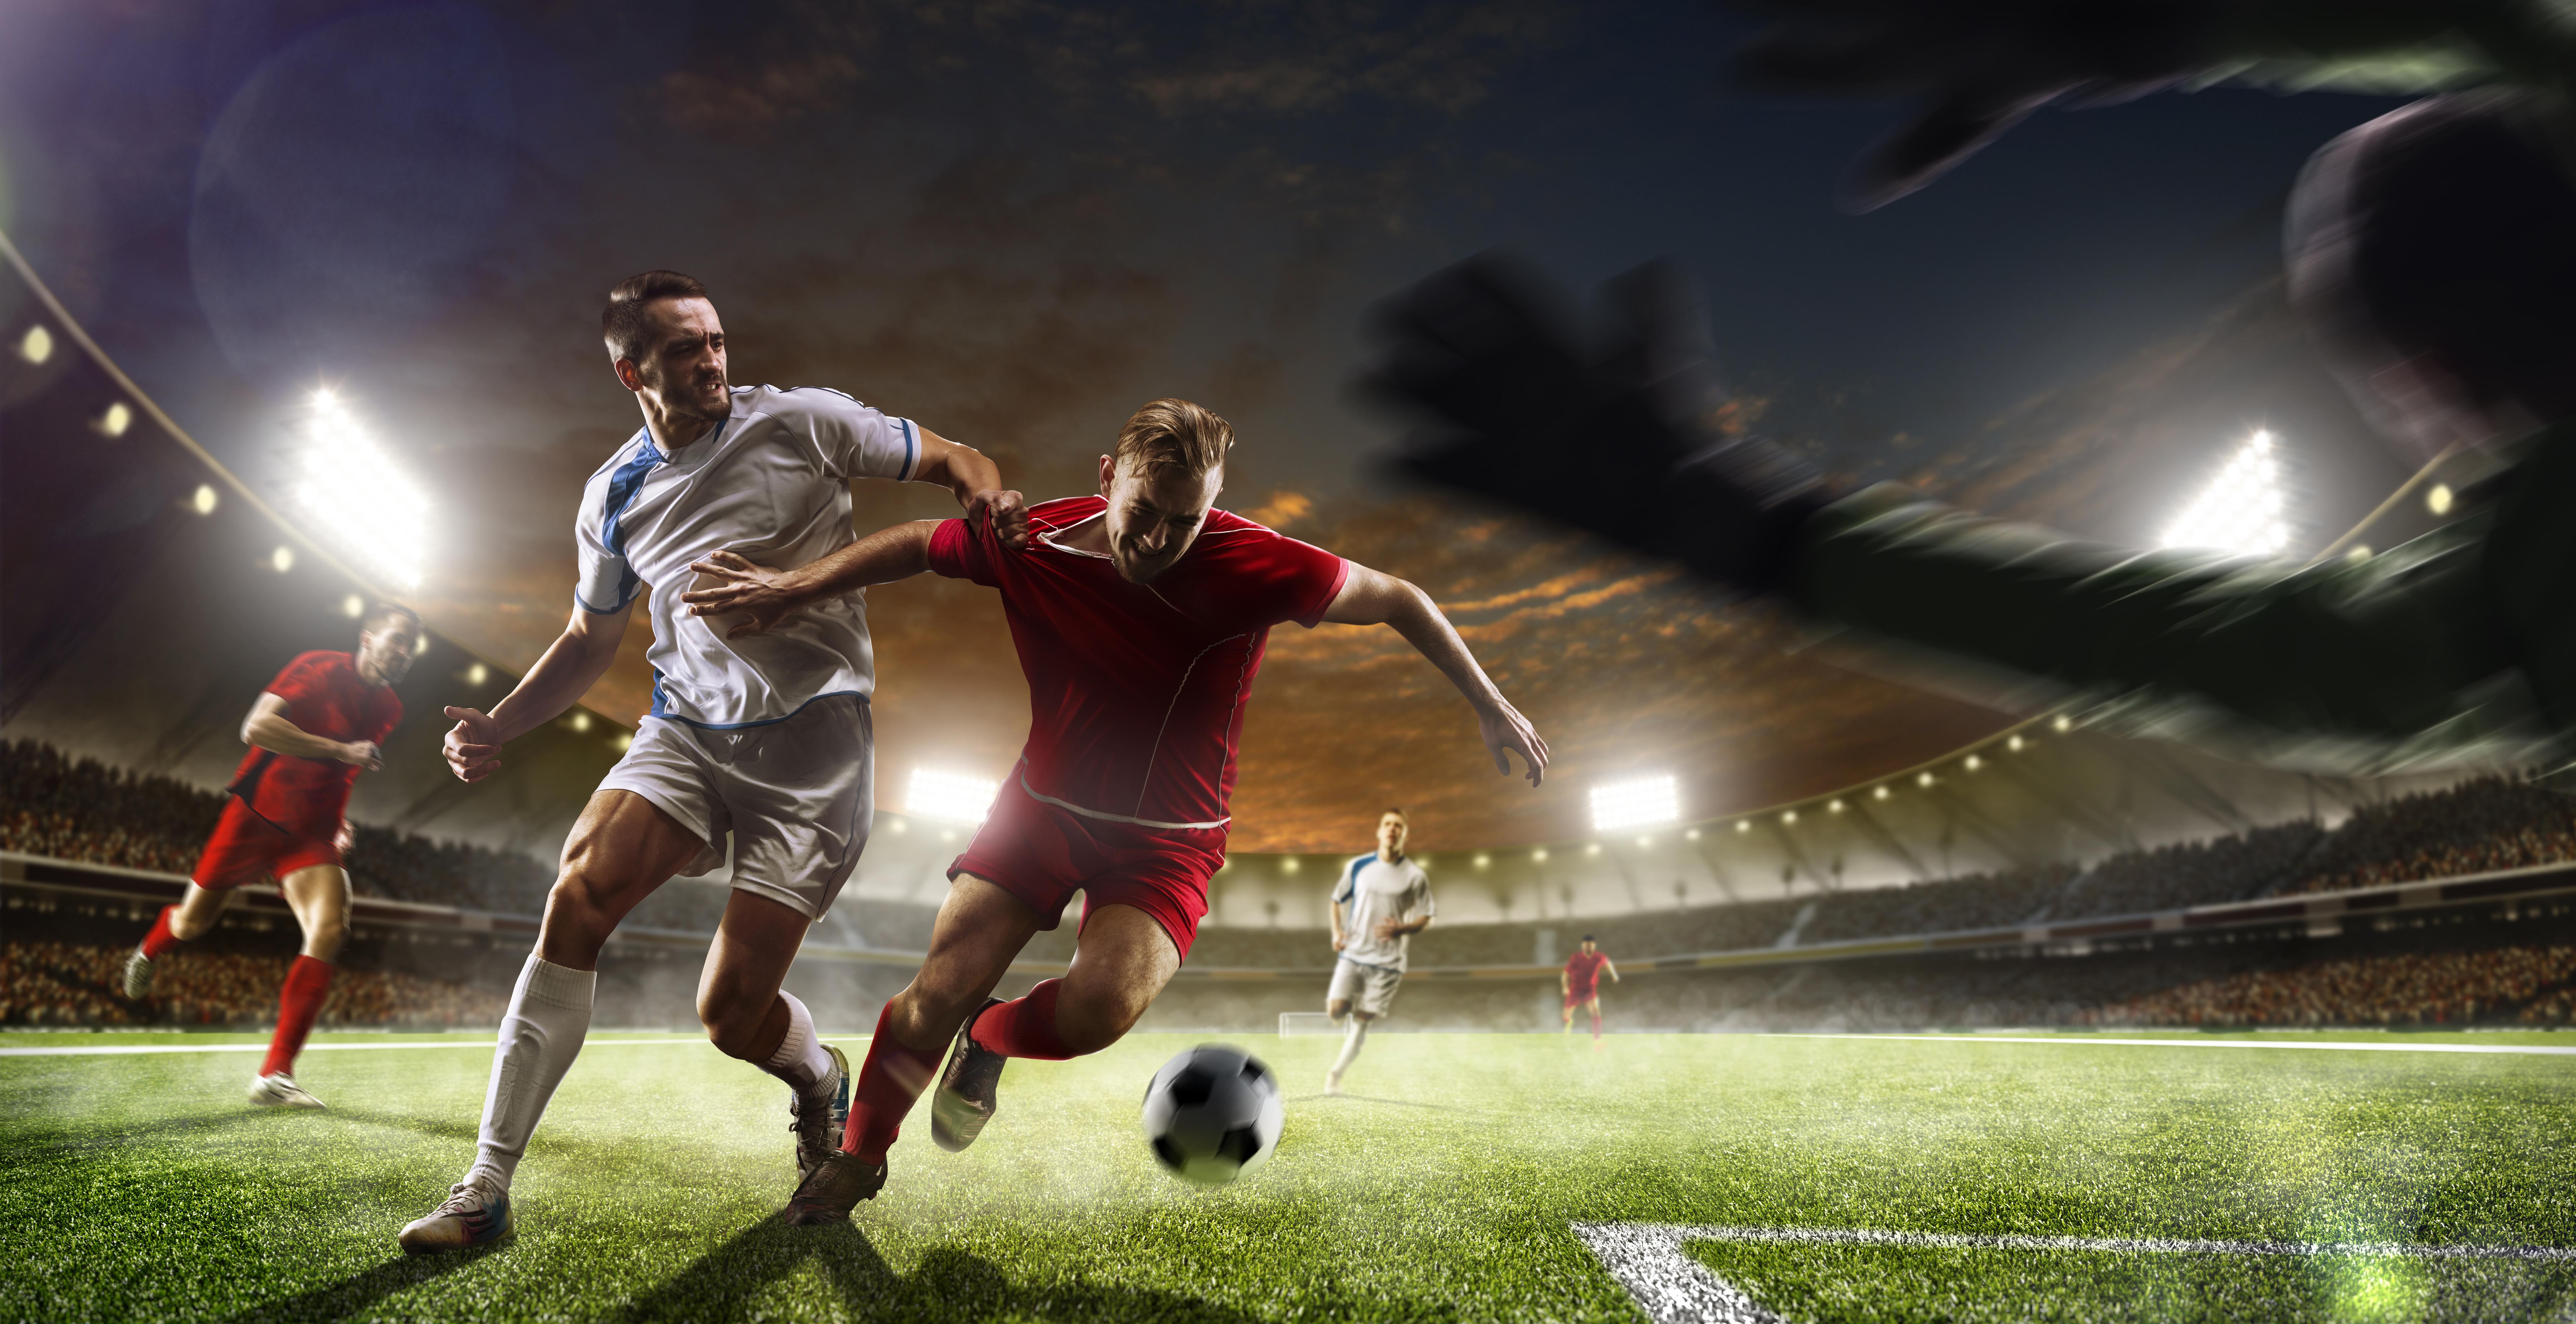 Fussball 5k Retina Ultra Hd Wallpaper Hintergrund